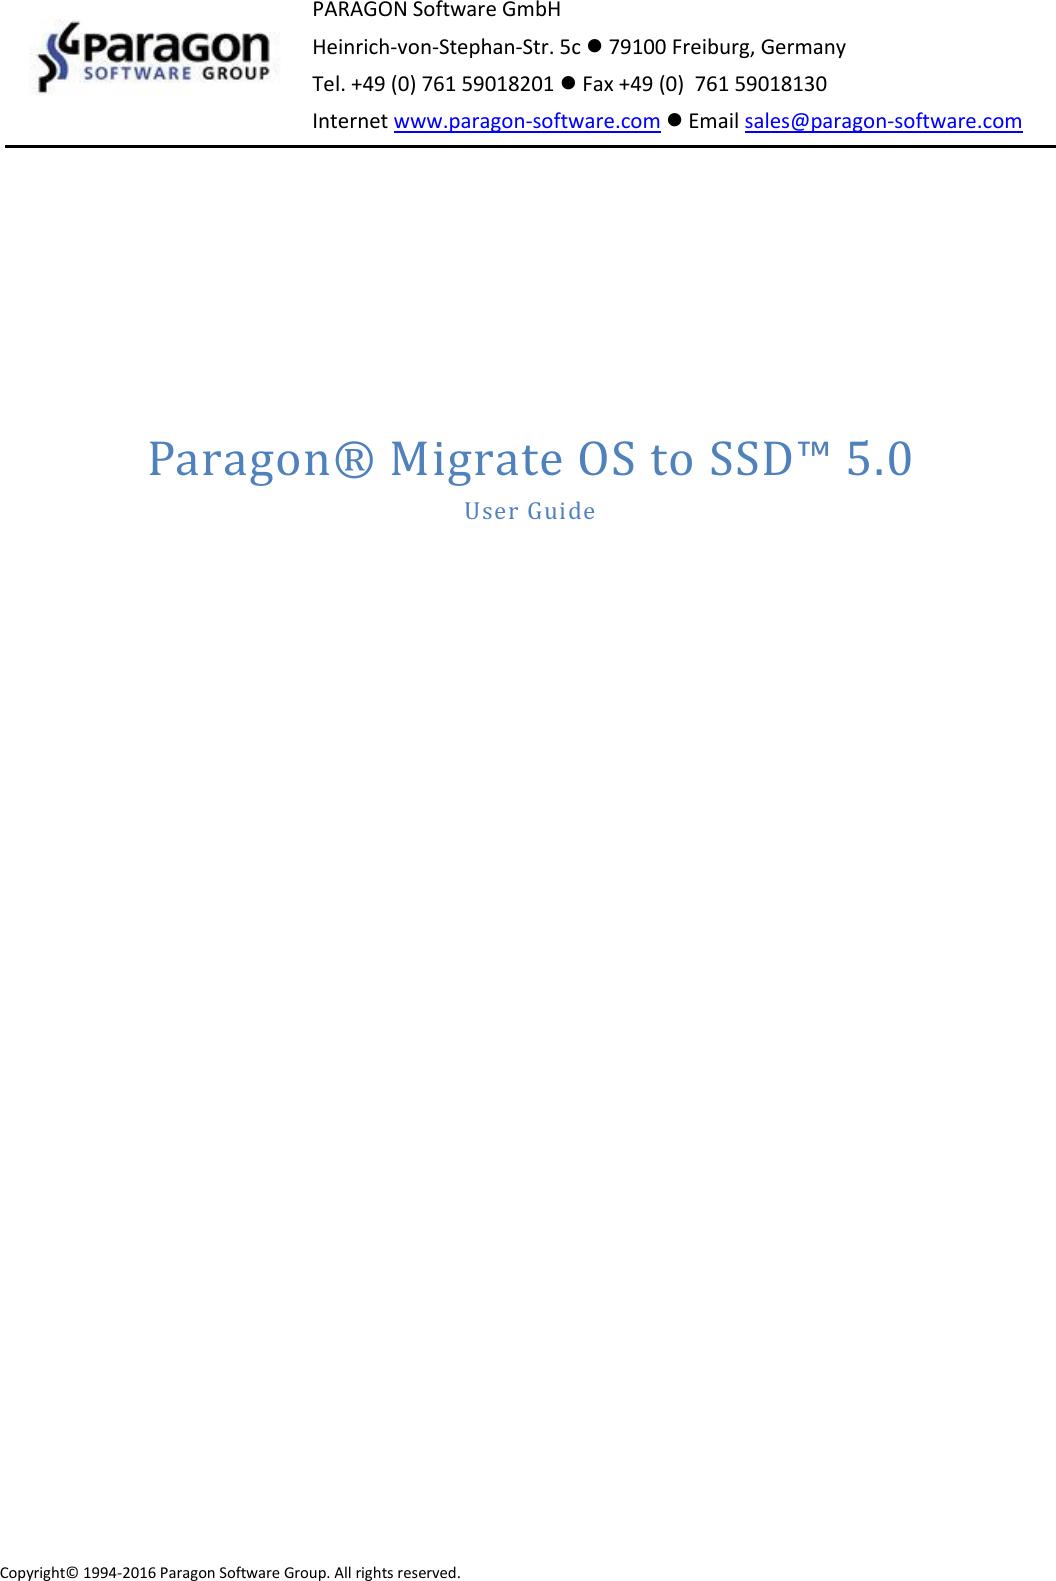 paragon migrate os to ssd инструкция